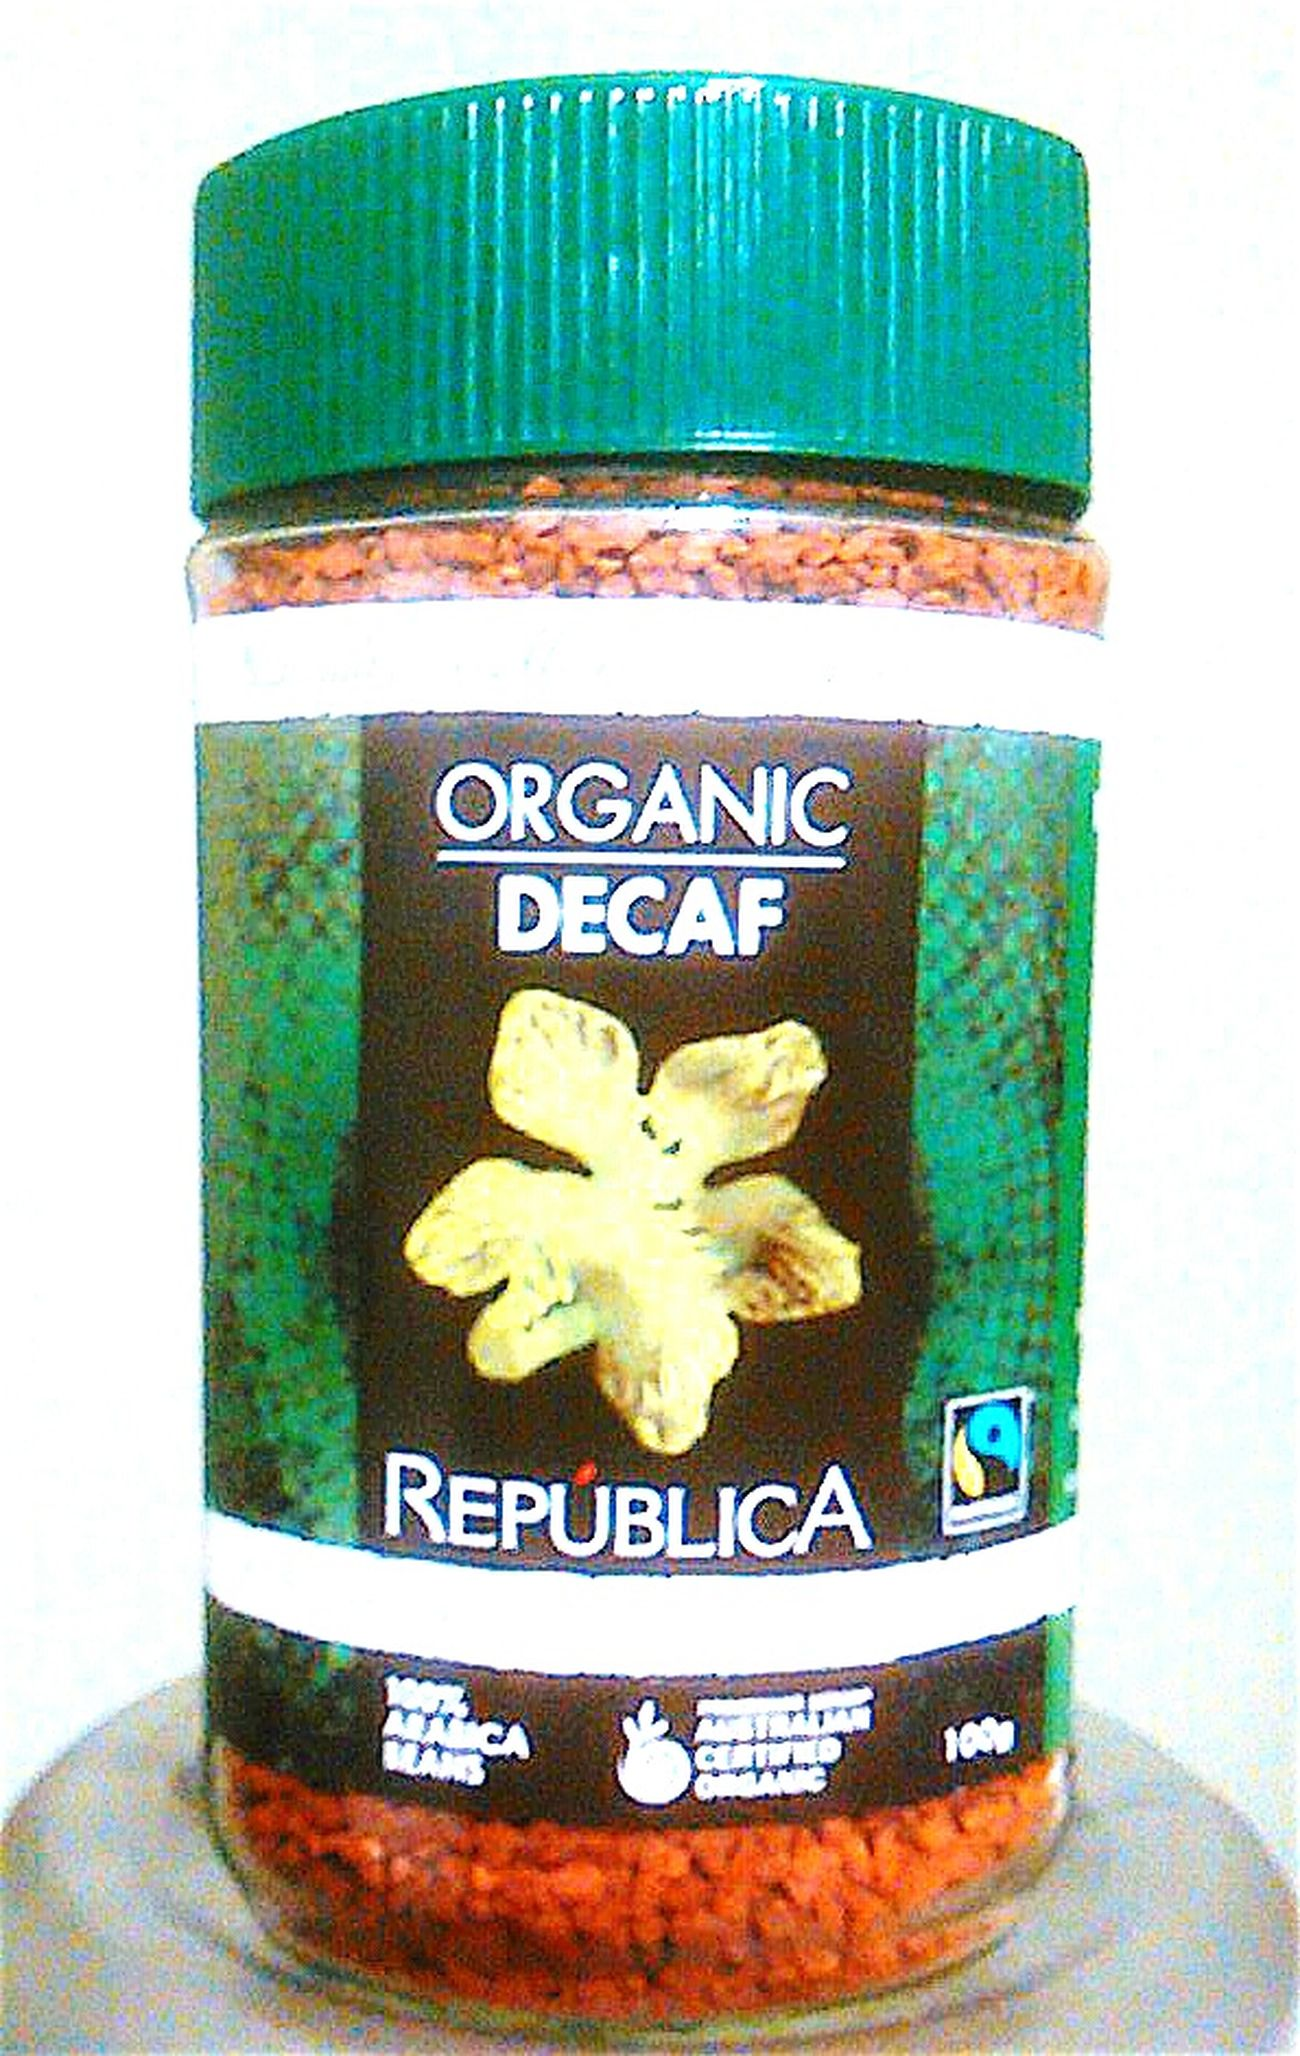 República  Organic Decaf Coffee Caffeine Free OrganicmarketCaffeineFree Decaf